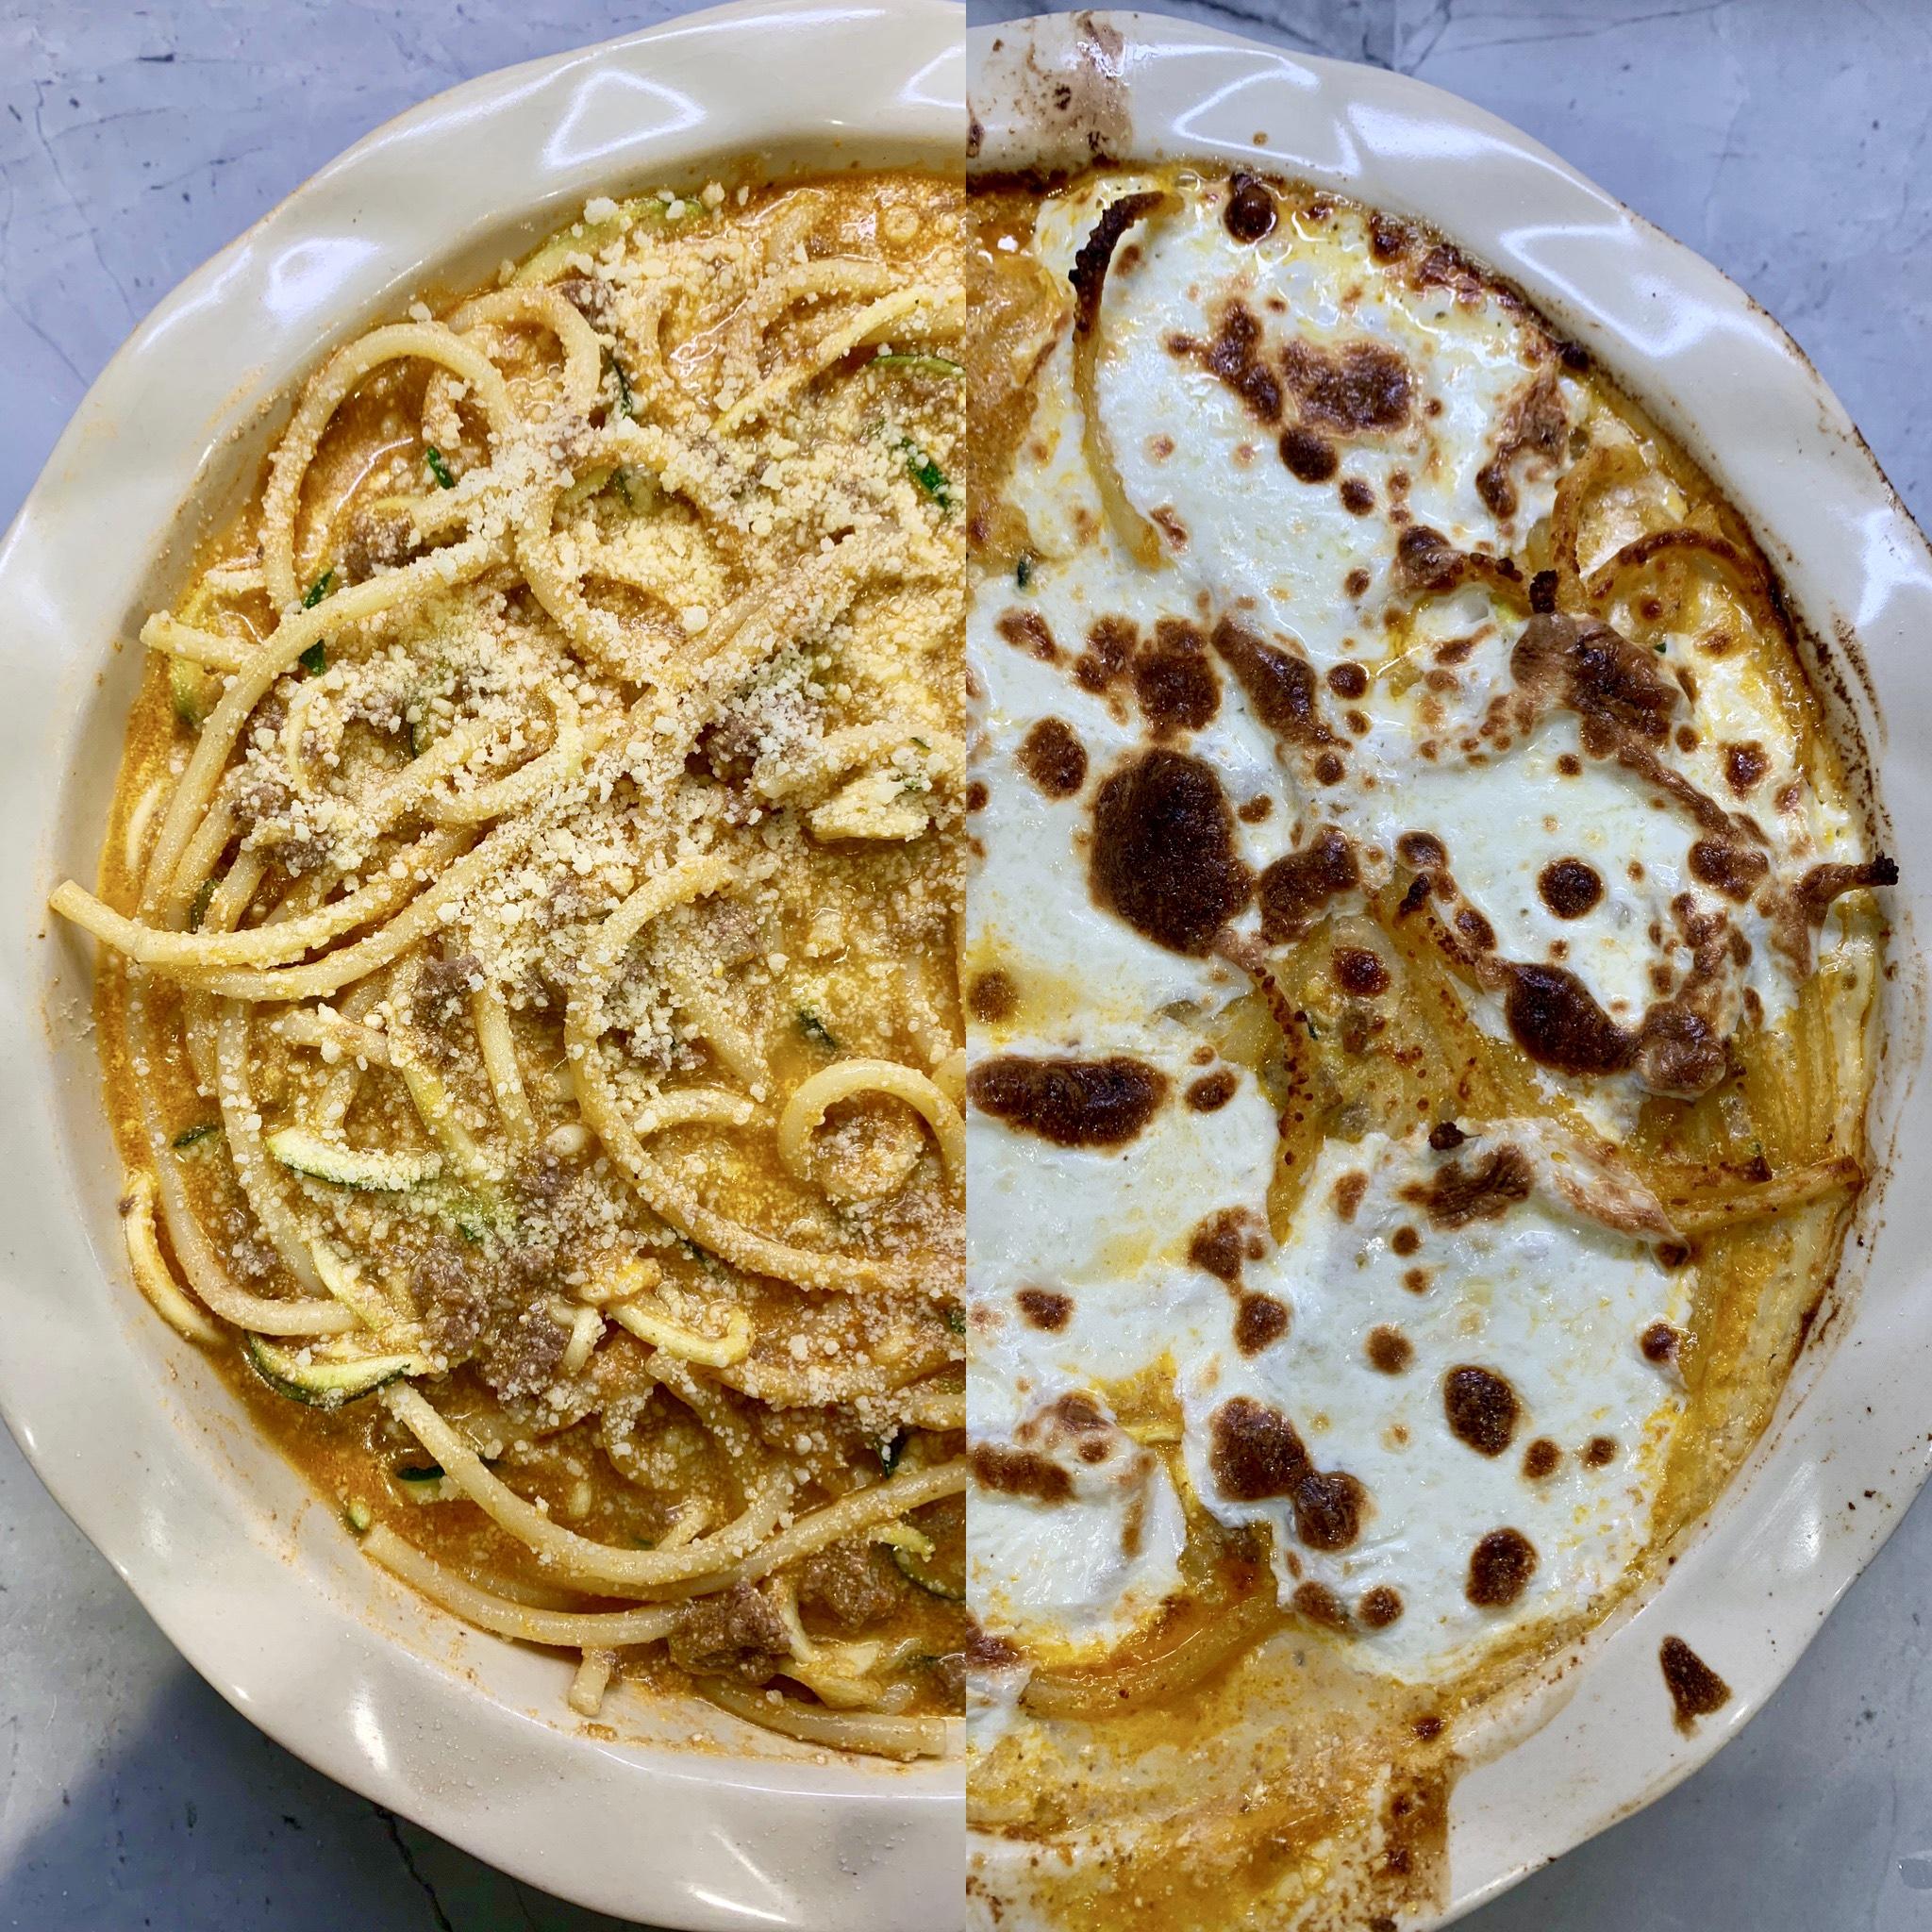 Spaghetti and Zucchini Pie, Oh My!